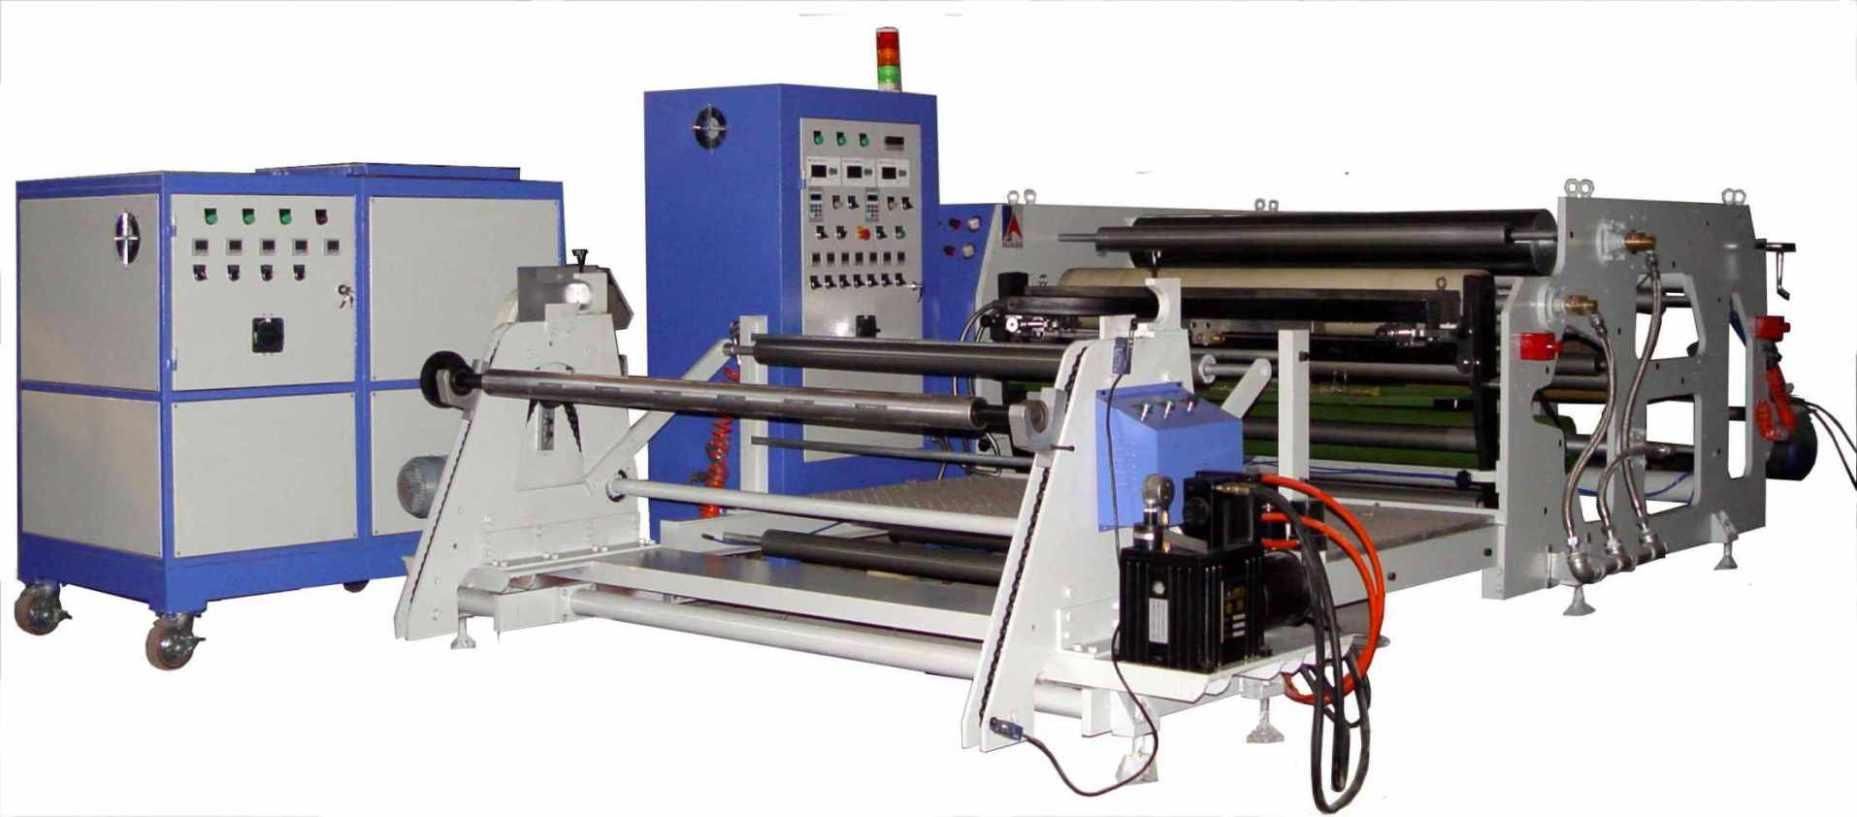 RT系列热熔胶涂布机 此RT系列热熔胶涂布机是一款最实用的一机多用的热熔胶涂布机,其优良的性能特点如下: 1、 技术参数 Technical Parameters 型号 Model RT 涂布宽度 coating width: 400mm-2500mm 涂布量 coating qunty : 15-200g/ 涂布速度 coating speed: 50m/min 放卷直径 Dia.